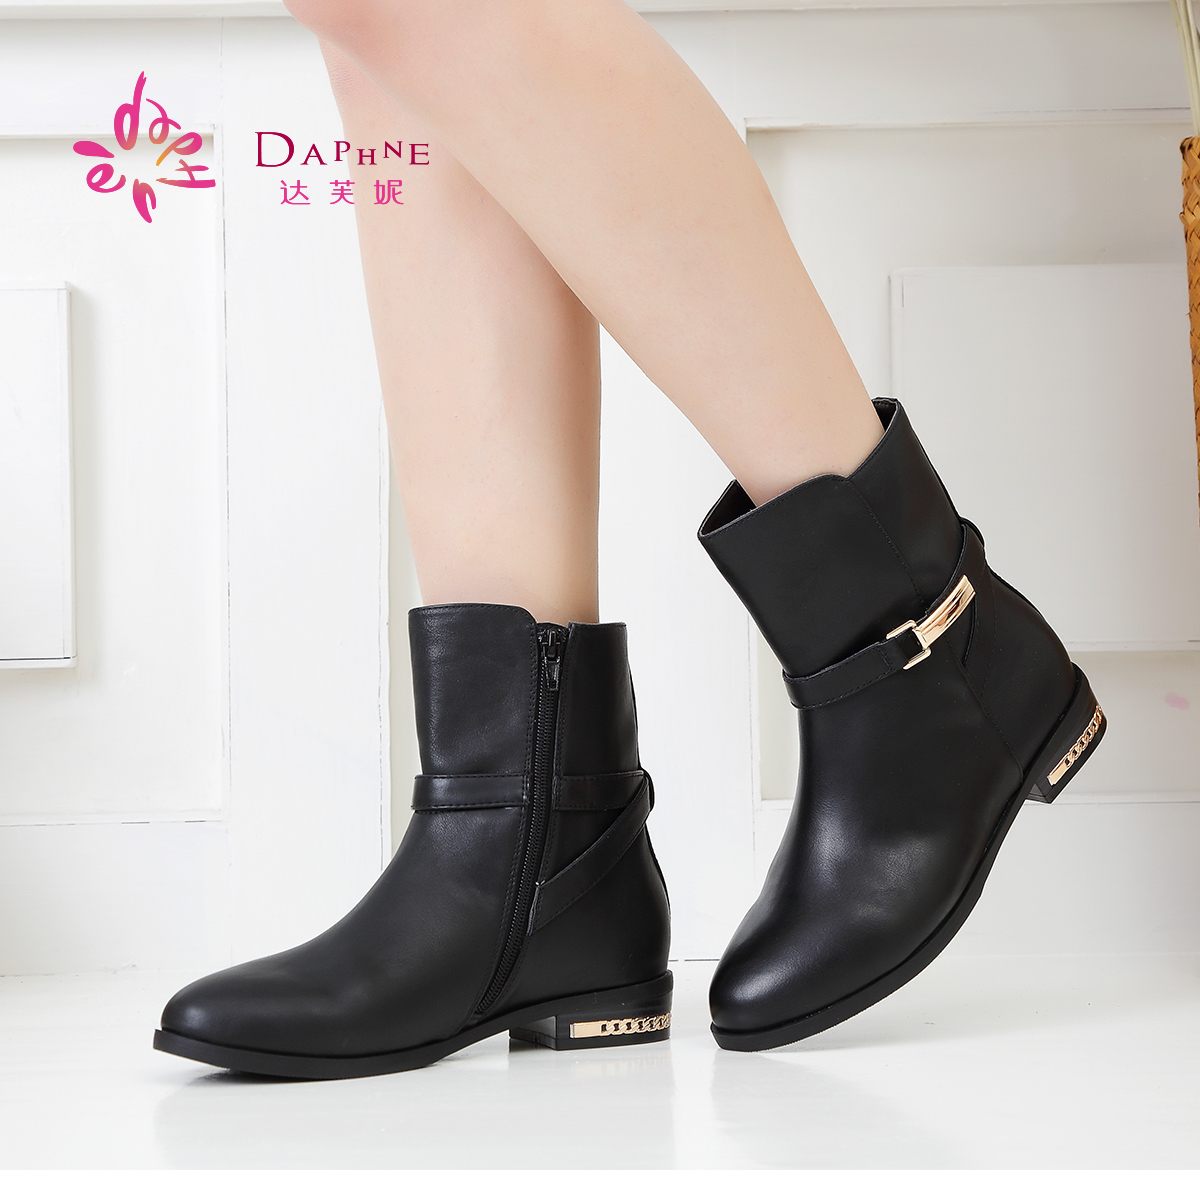 Daphne/达芙妮秋冬女靴 通勤简约低跟圆头皮带扣短靴1014605177